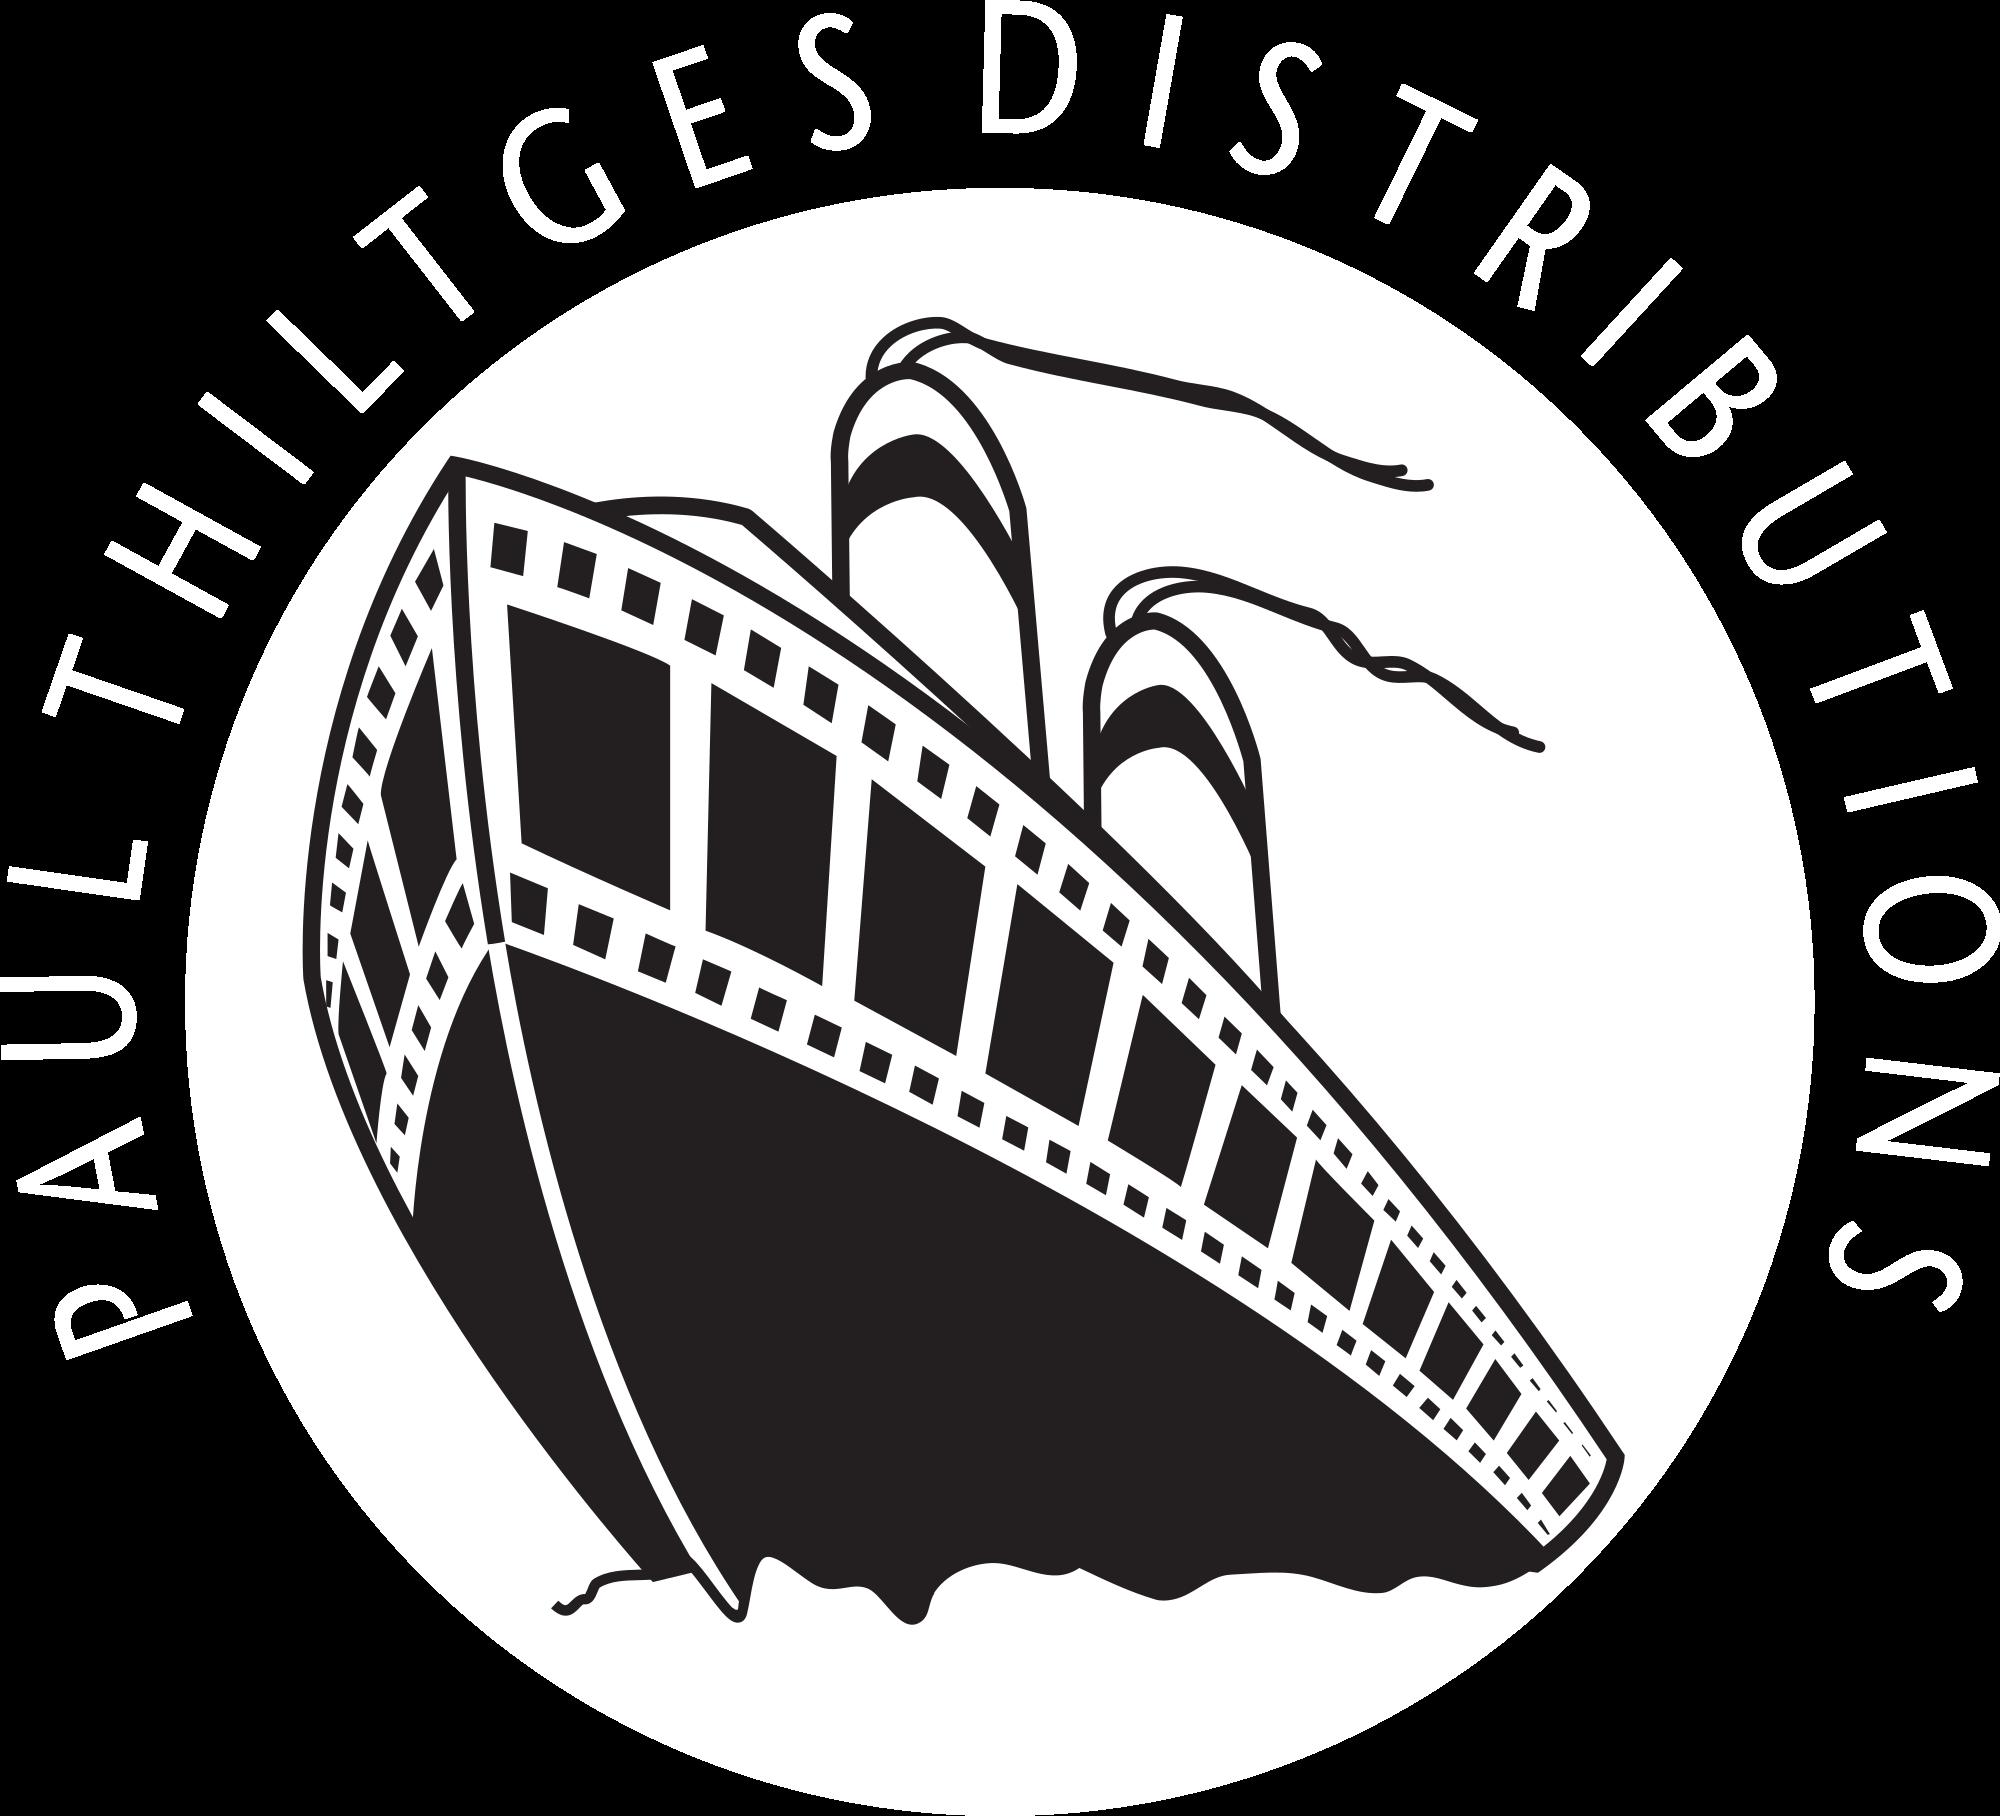 Paul Thiltges Distributions